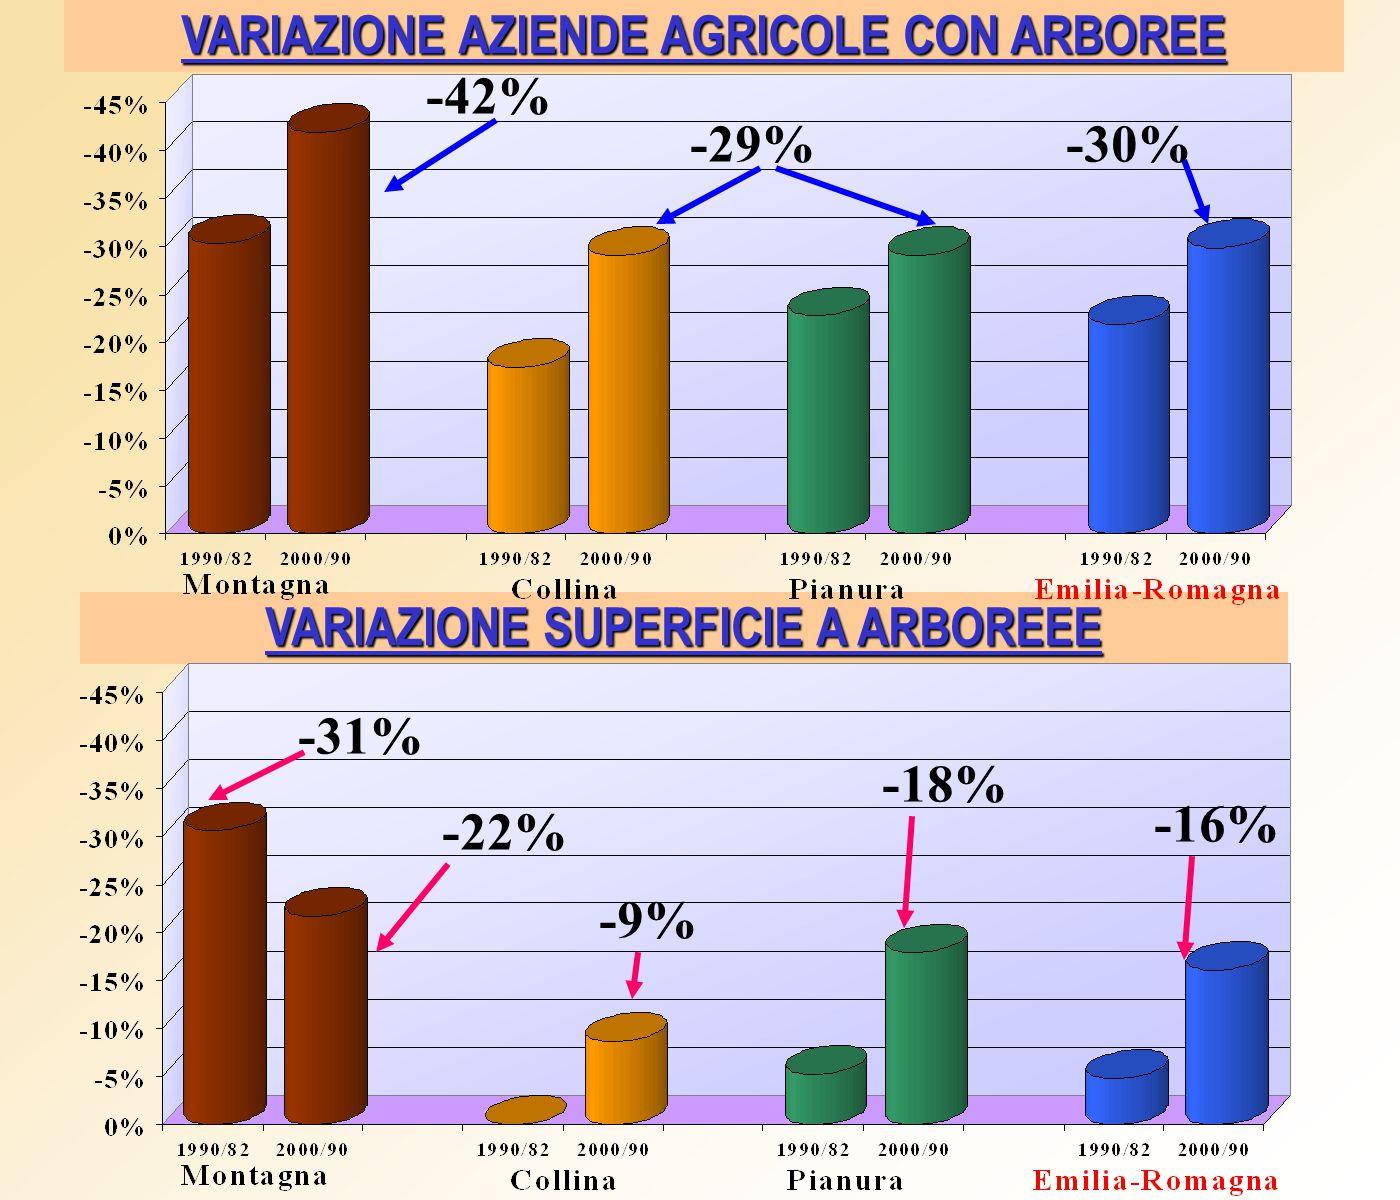 VARIAZIONE AZIENDE AGRICOLE CON ARBOREE VARIAZIONE SUPERFICIE A ARBOREEE -42% -29%-30% -31% -22% -9% -18% -16%